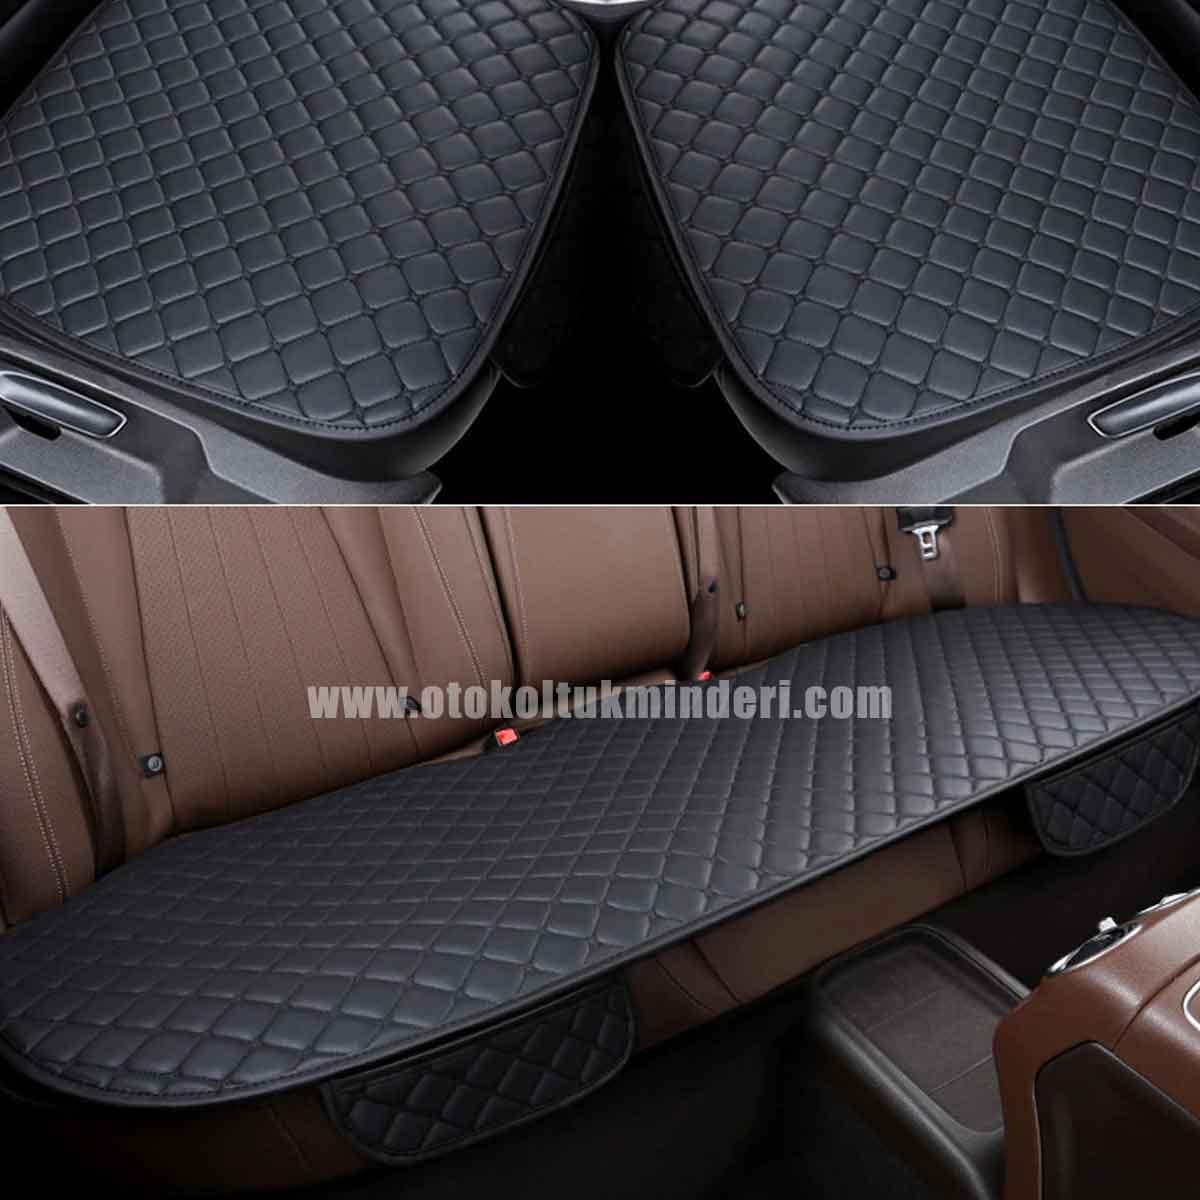 Mitsubishi koltuk kılıfı deri - Mitsubishi Koltuk minderi Siyah Deri Cepli